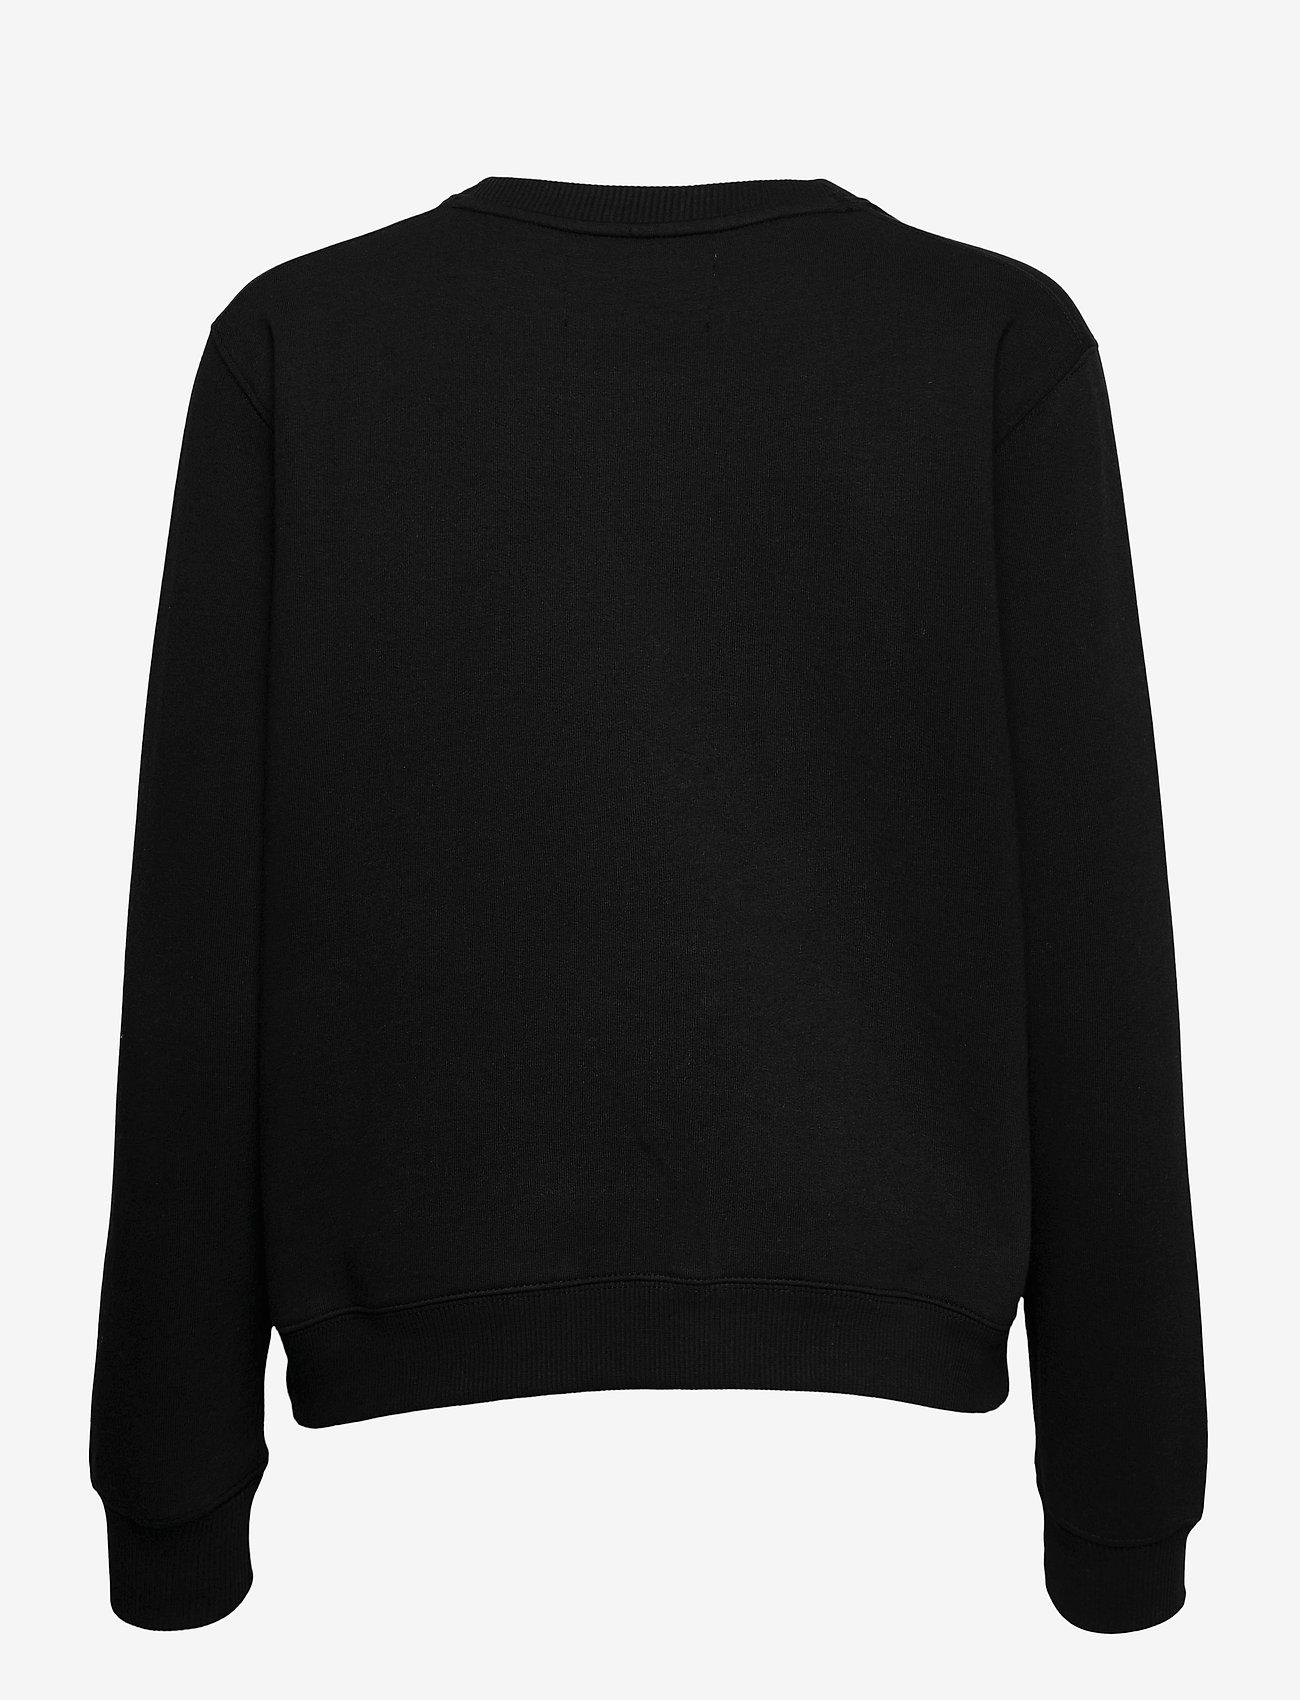 Calvin Klein Jeans - MONOGRAM LOGO CREW NECK - sweatshirts - ck black/party pink - 1